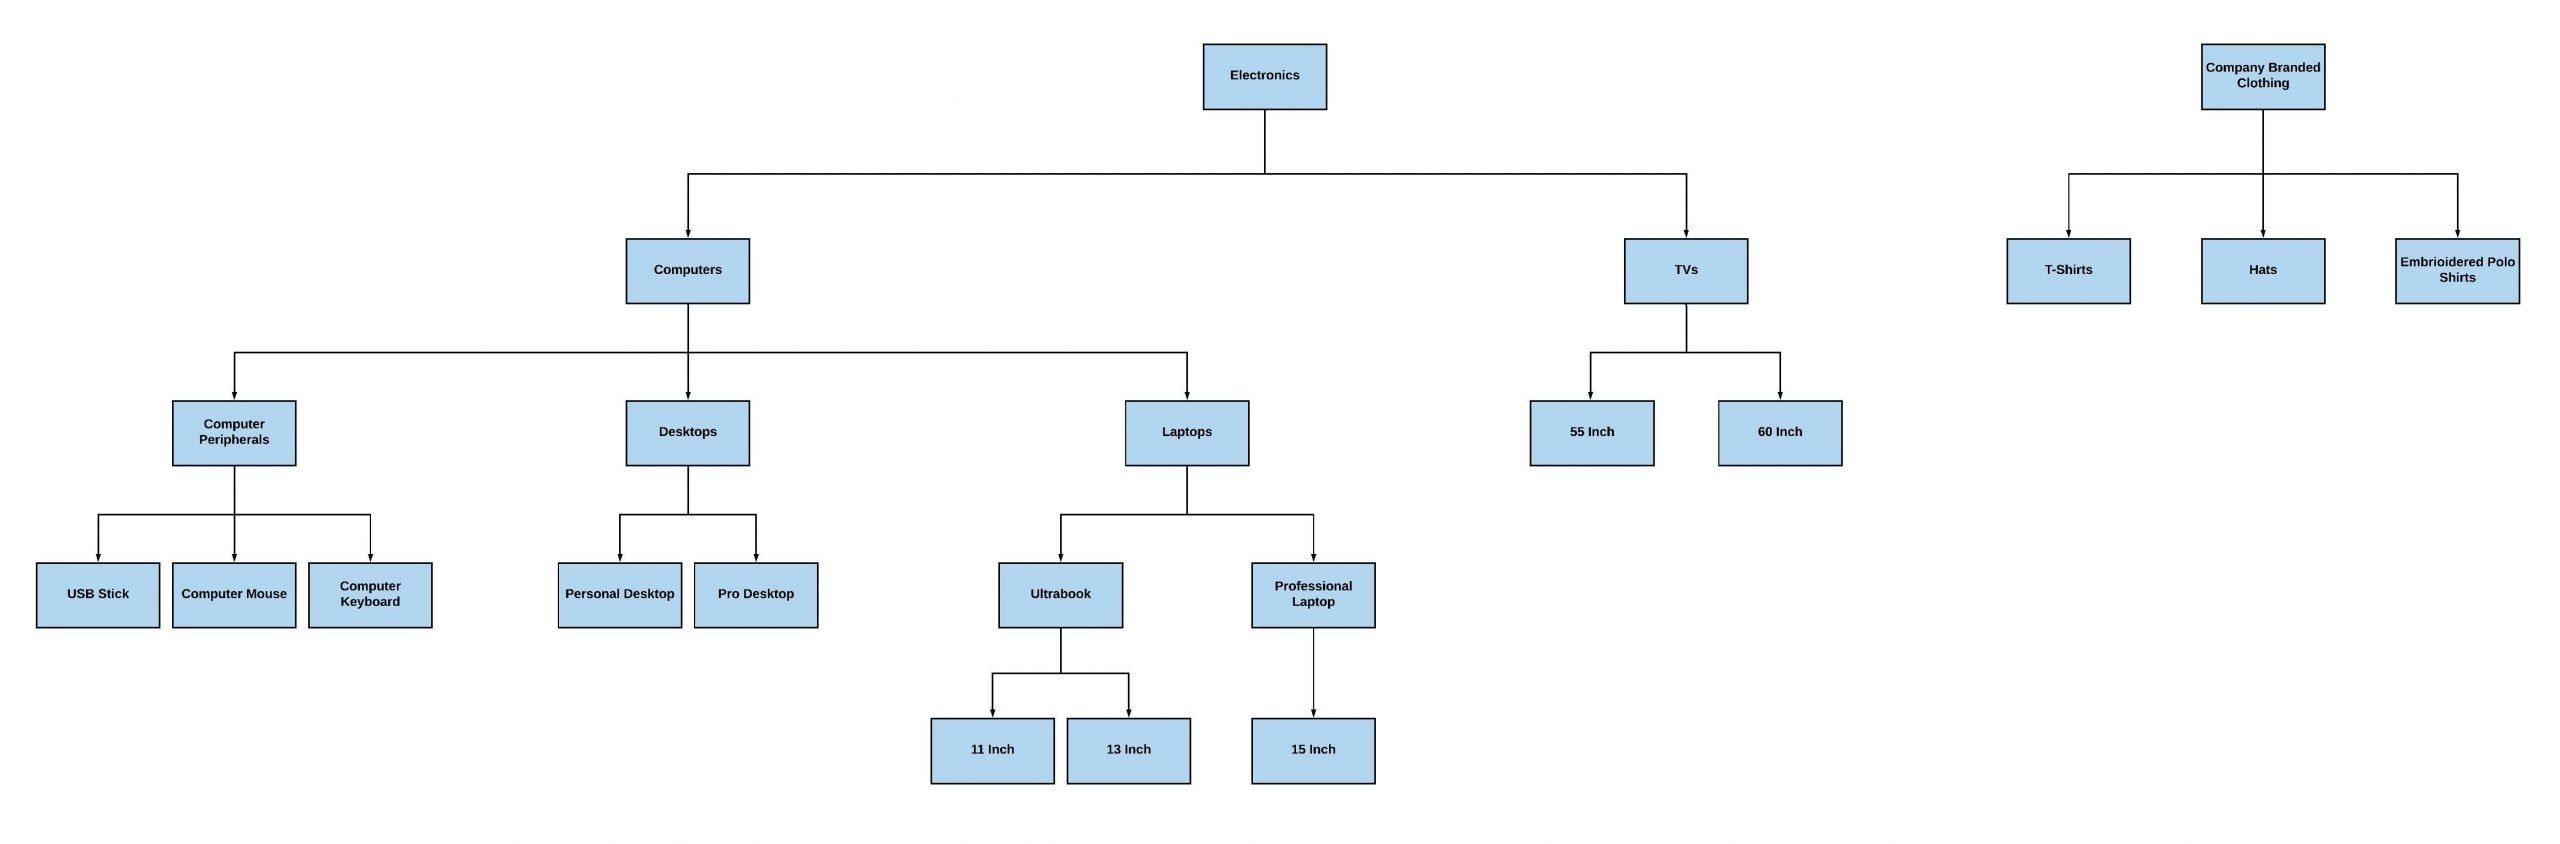 Hanby Fractal Information Theory Segmentation Example